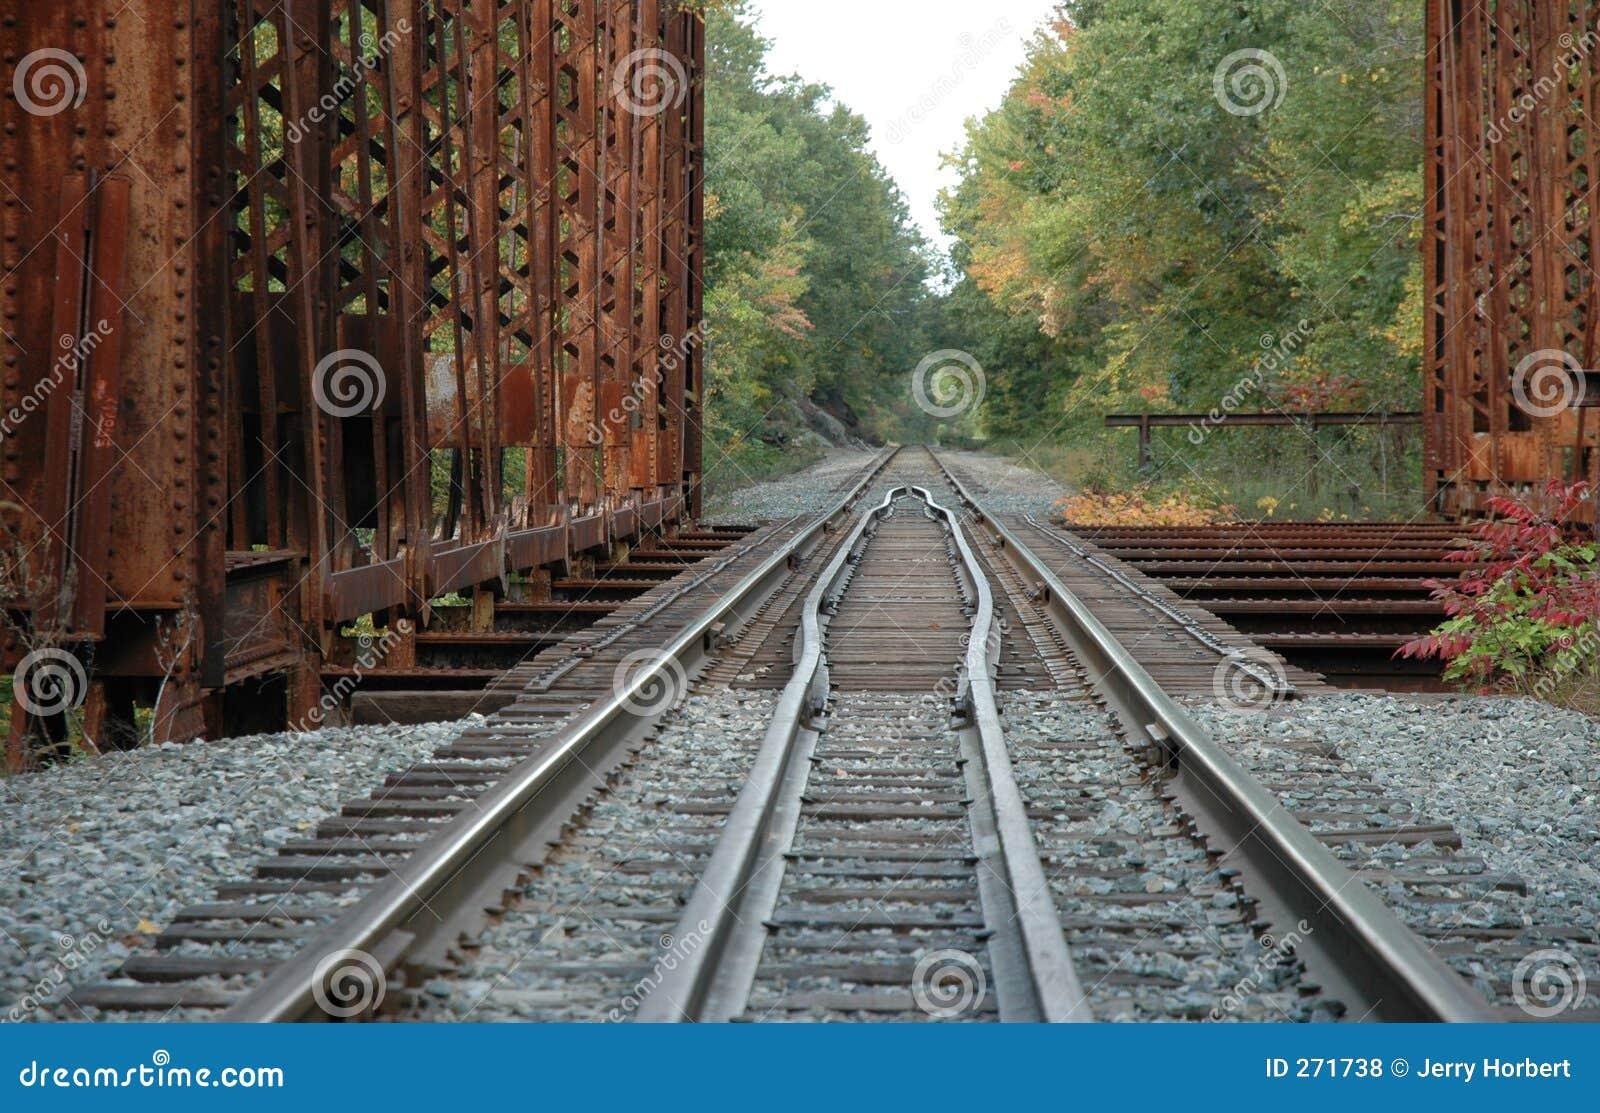 Railroad Tracks Over Bridge Royalty Free Stock Photos - Image: 271738